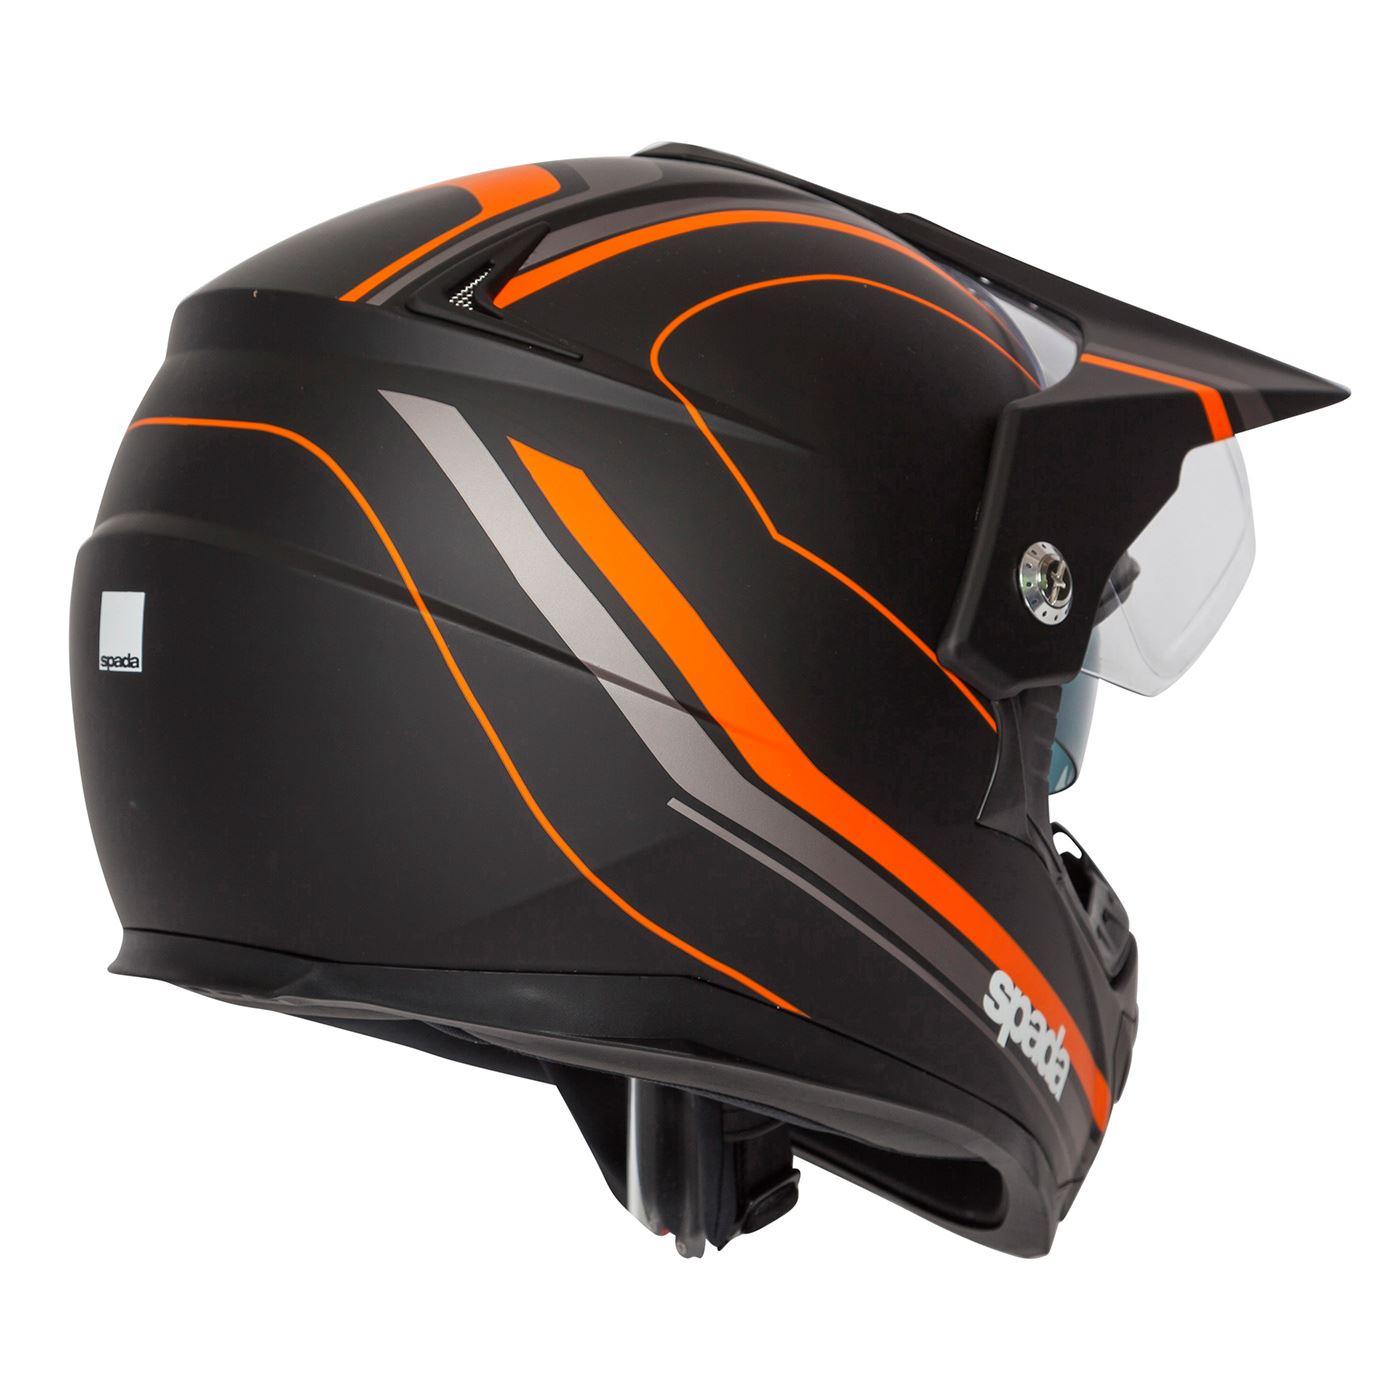 Spada-Intrepid-Full-Face-Motorcycle-Off-Road-Adventure-Style-Helmet-Sun-Visor thumbnail 23